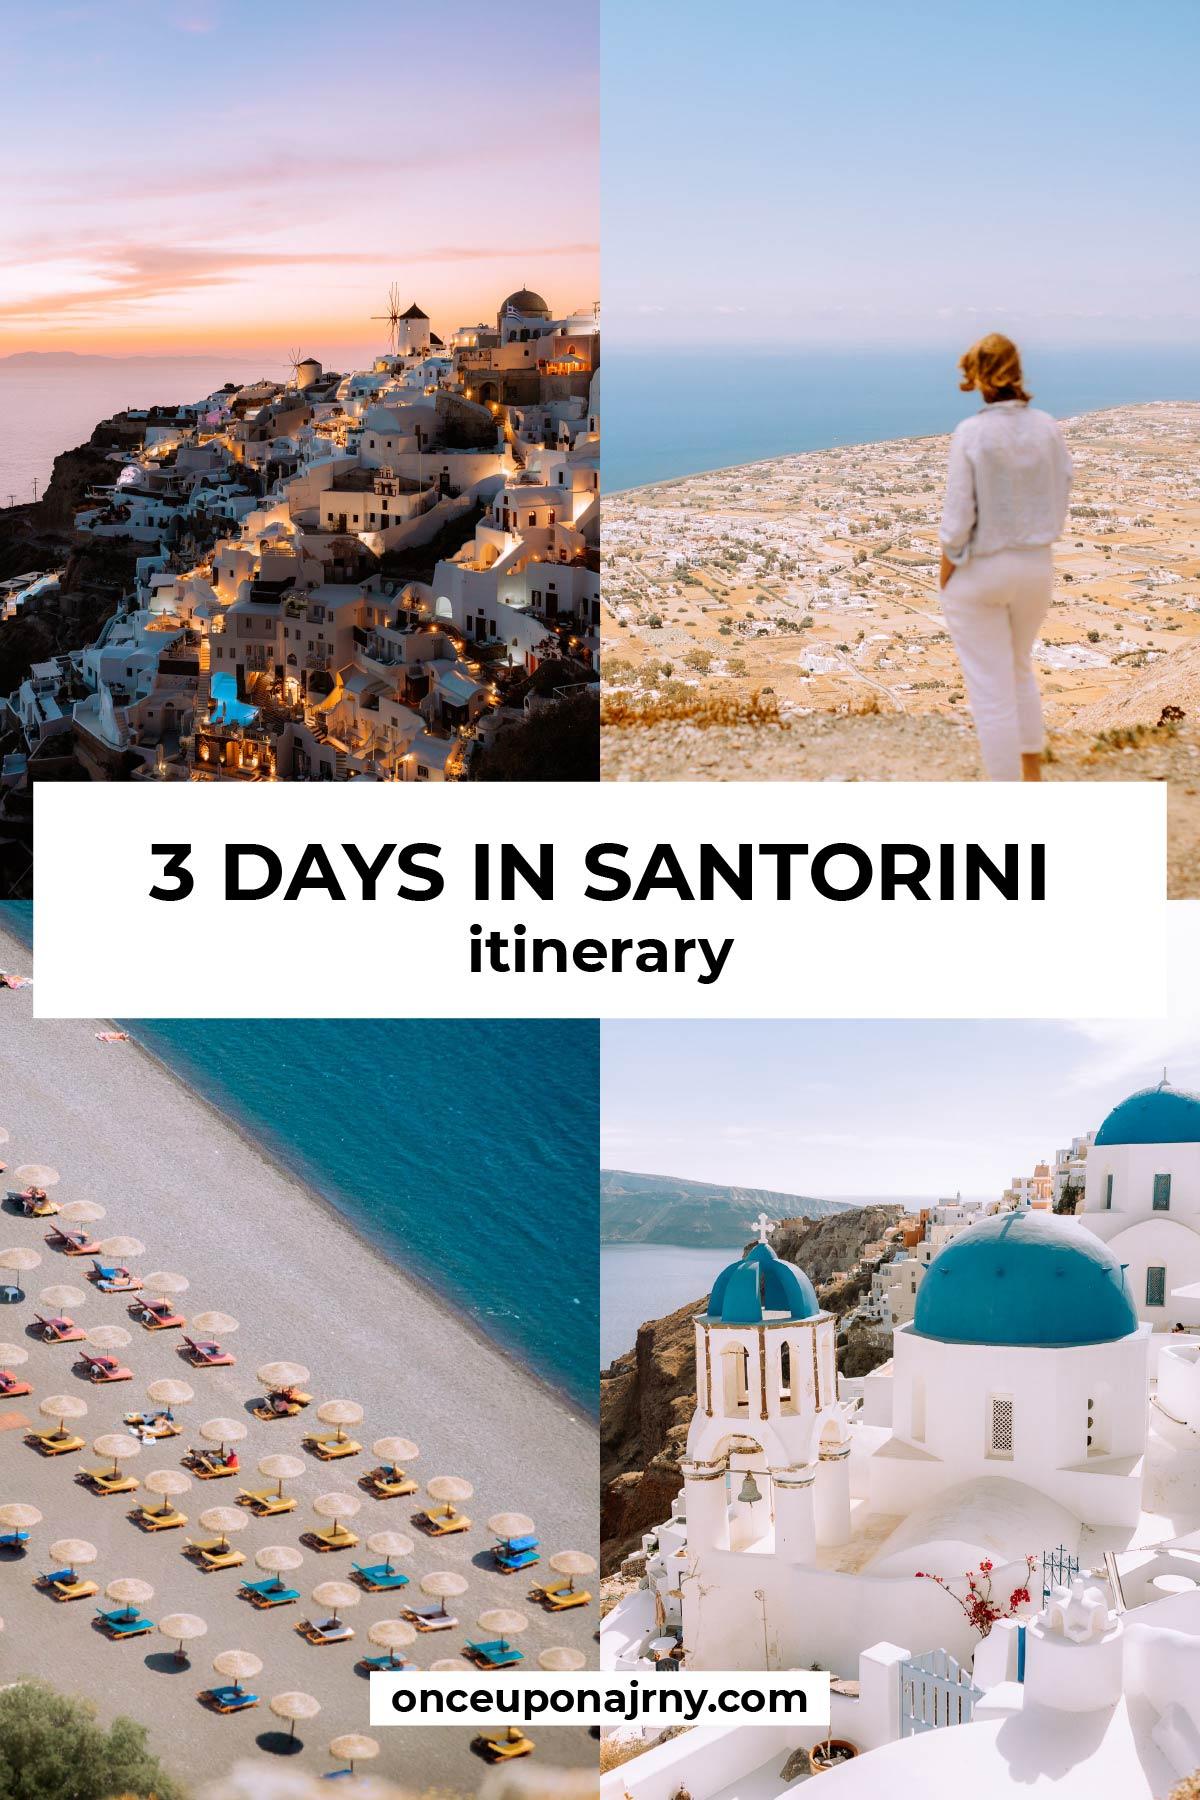 3 Days in Santorini Itinerary